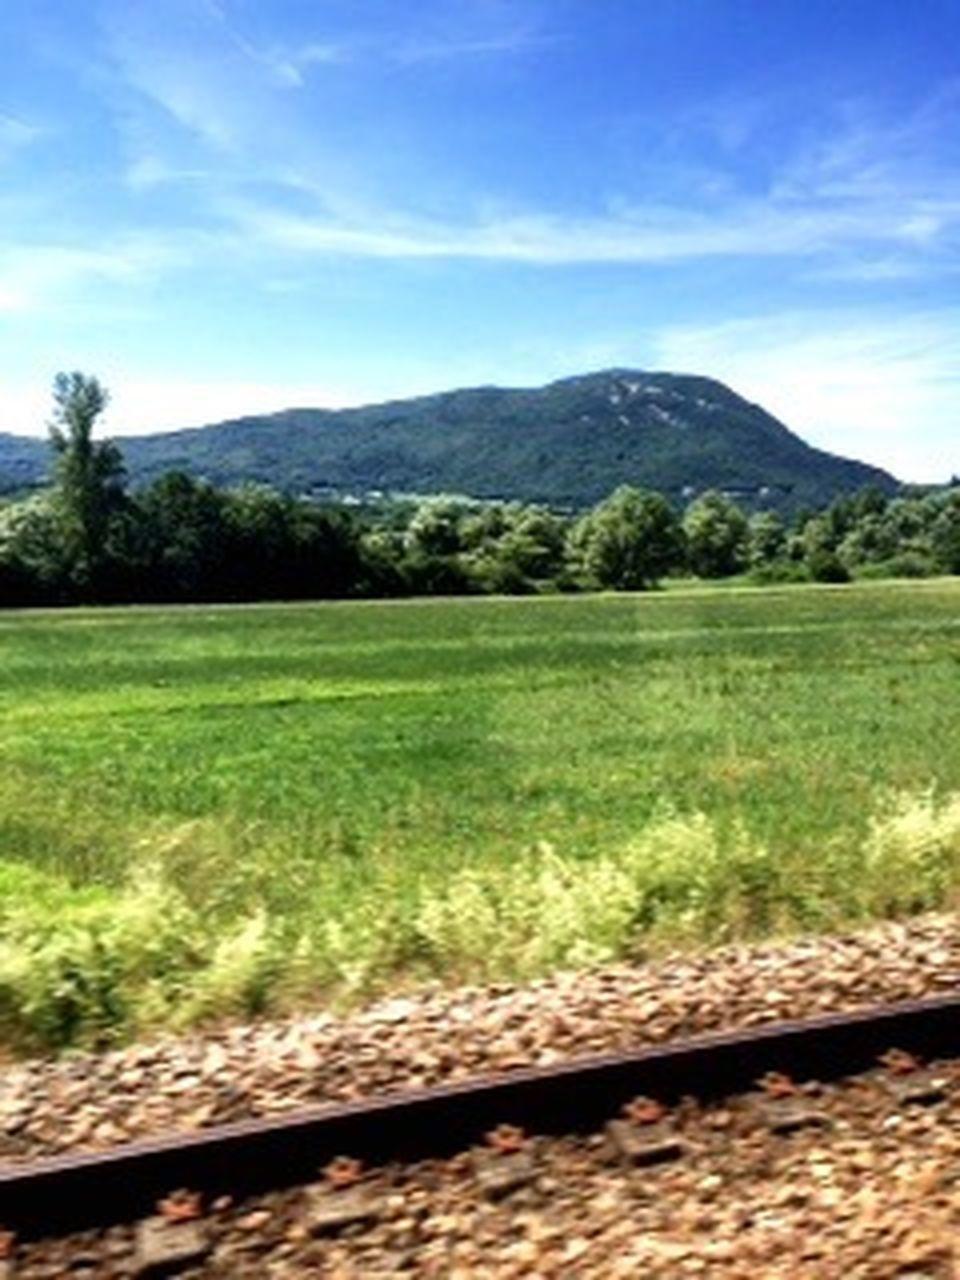 grass, mountain, landscape, scenics, nature, day, no people, outdoors, sky, mountain range, rural scene, tree